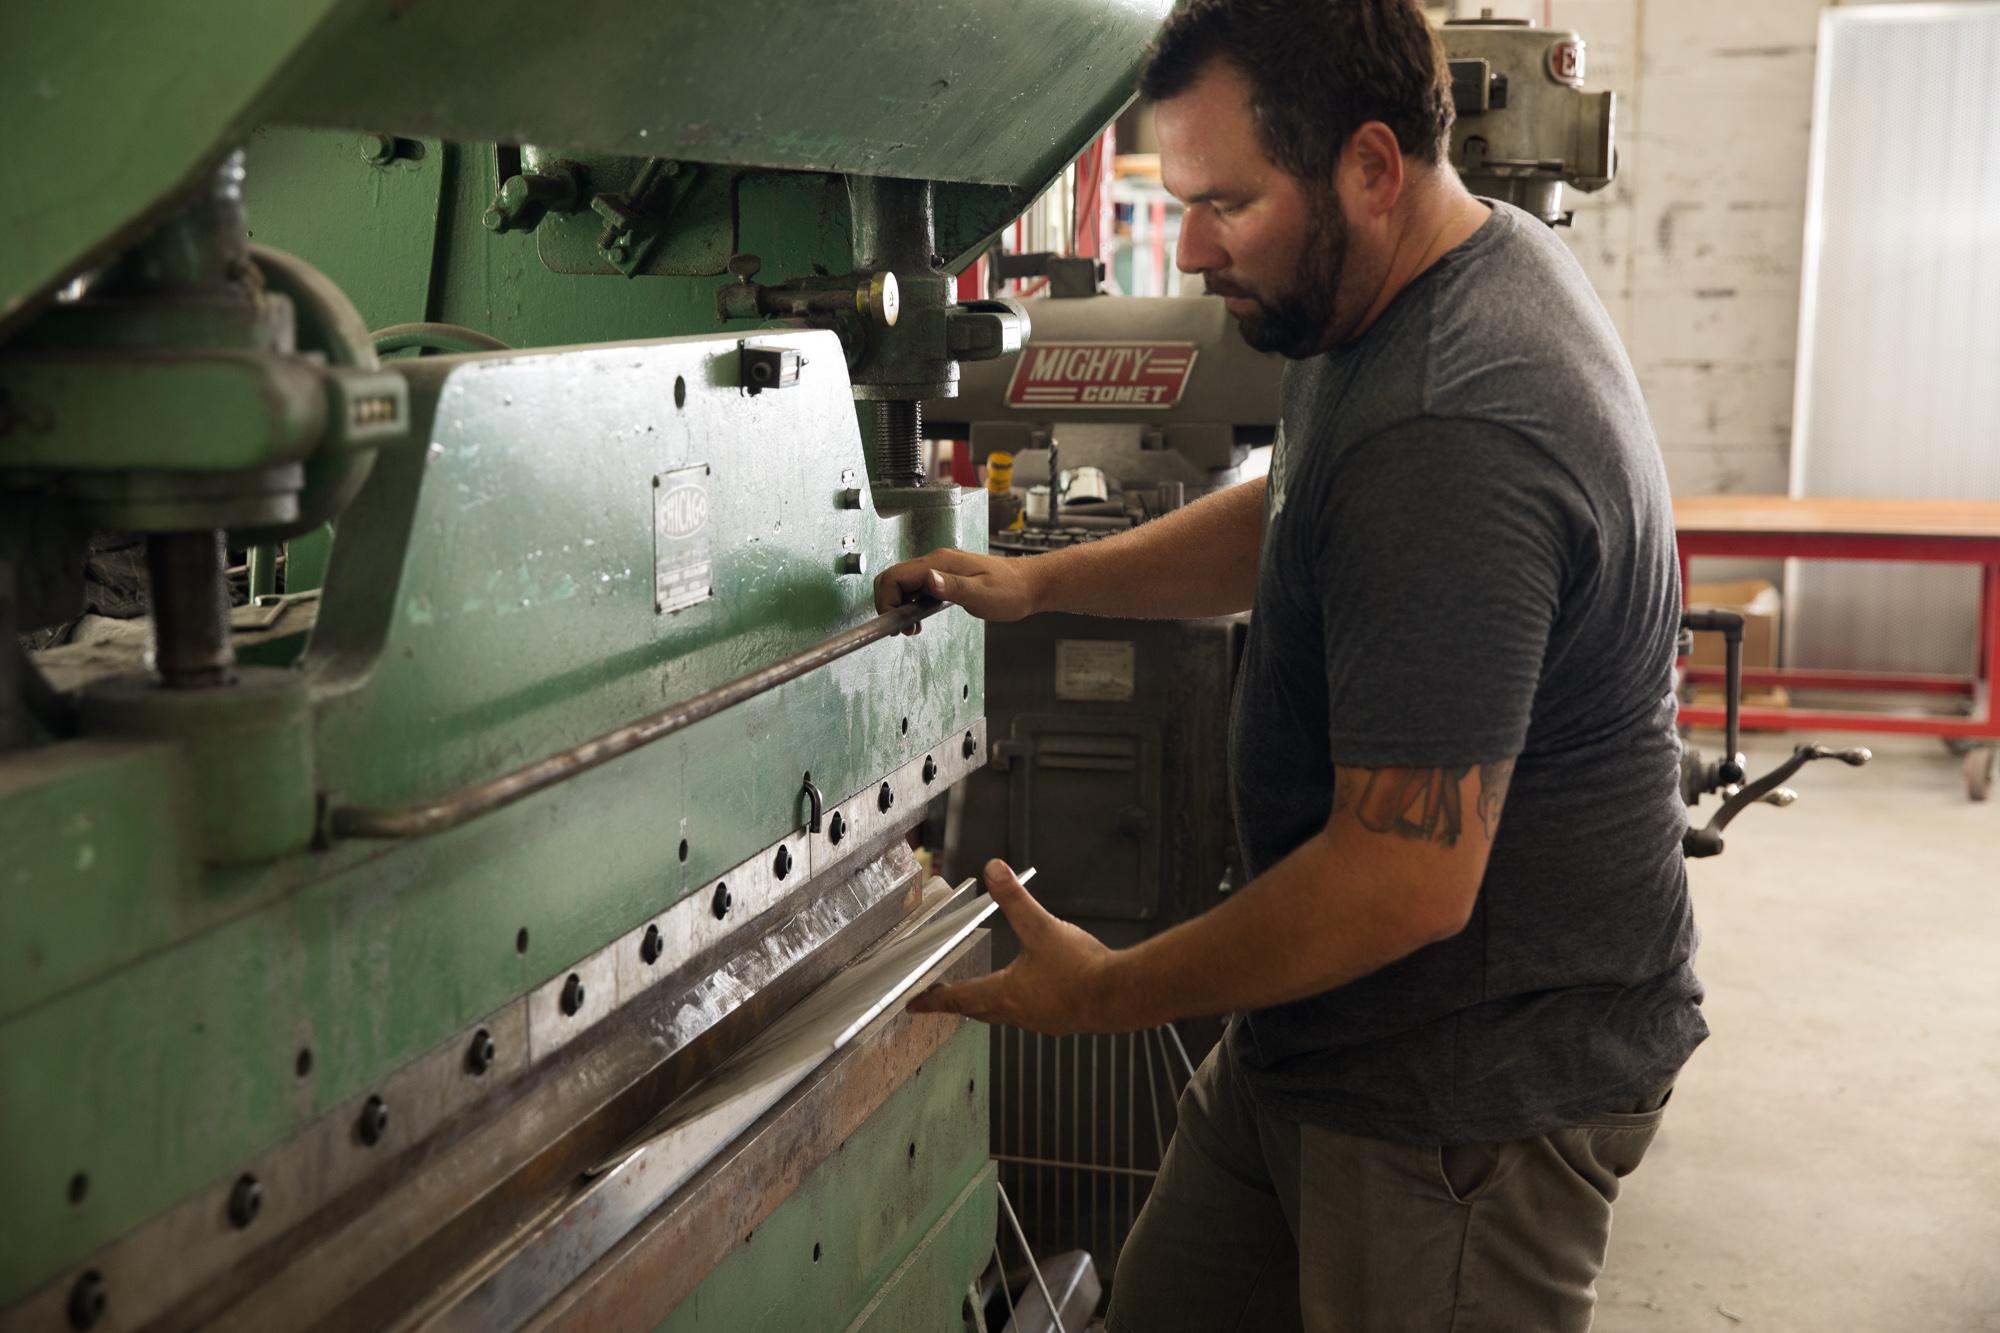 Metal Fabrication - Area 51 Powder Coating